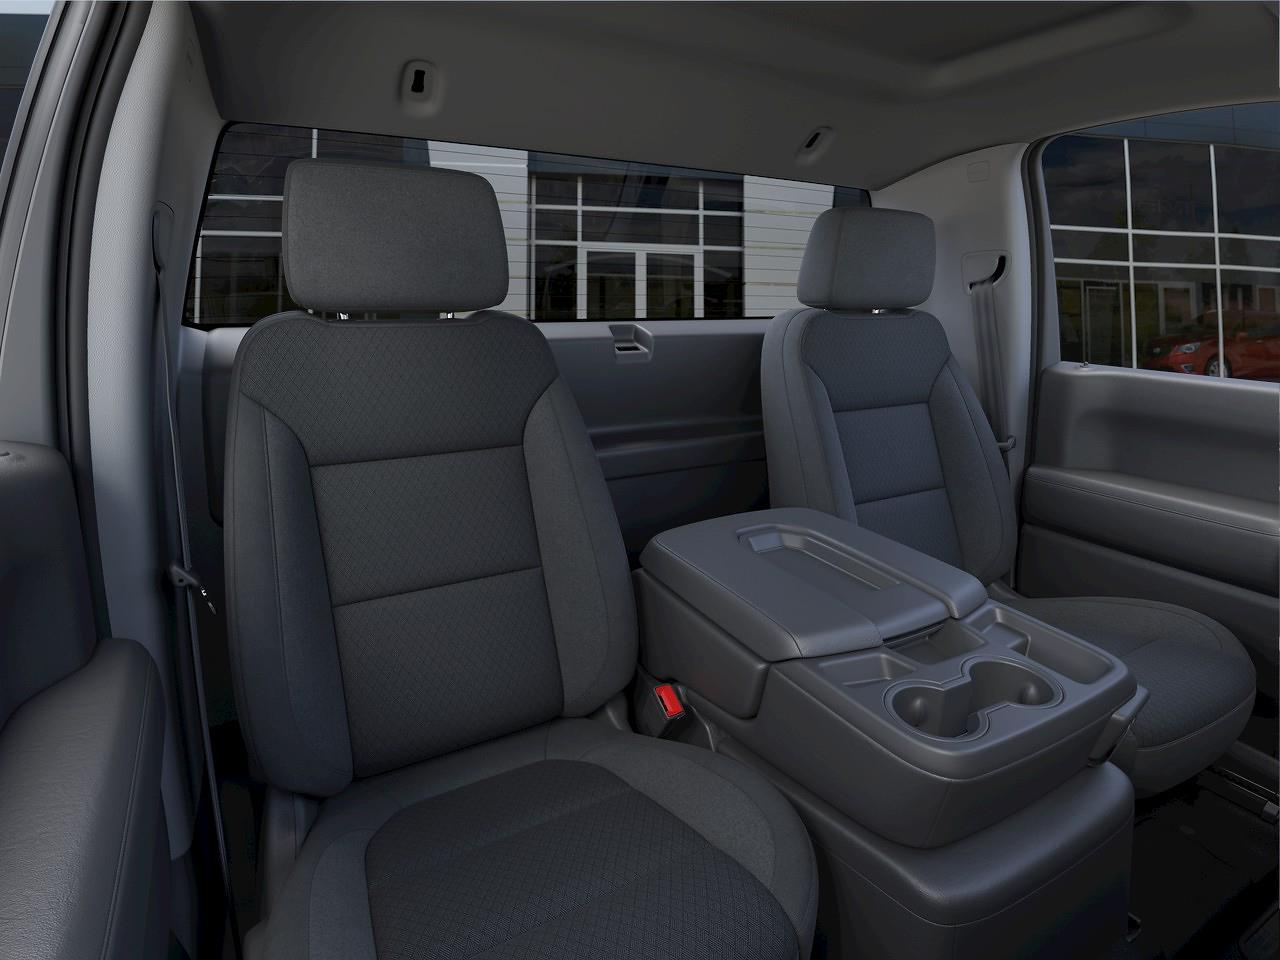 2021 GMC Sierra 1500 Regular Cab 4x4, Pickup #216917 - photo 33